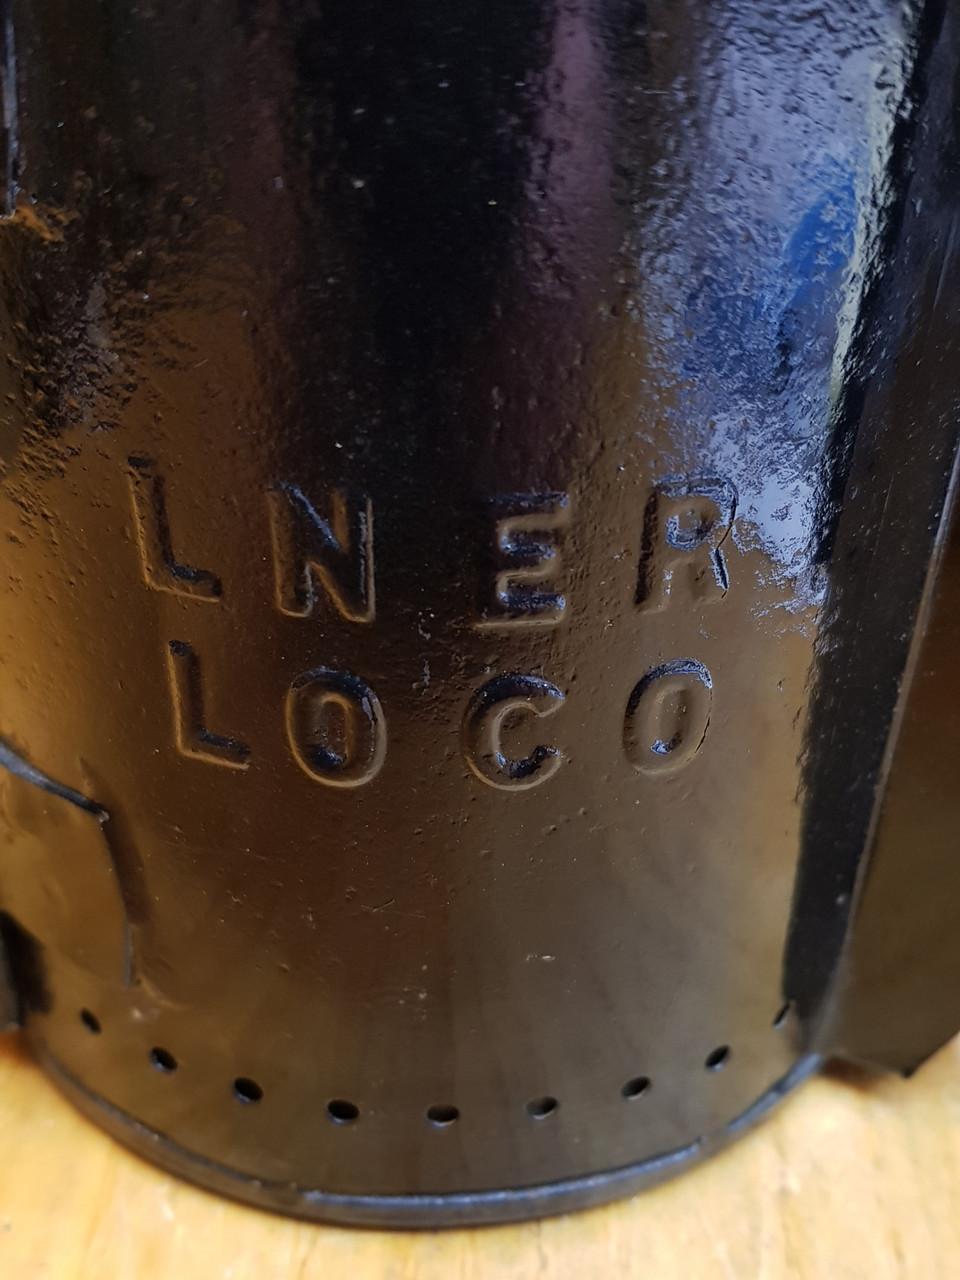 VT1264. LNER 2 ASPECT LOCO HAND LAMP.